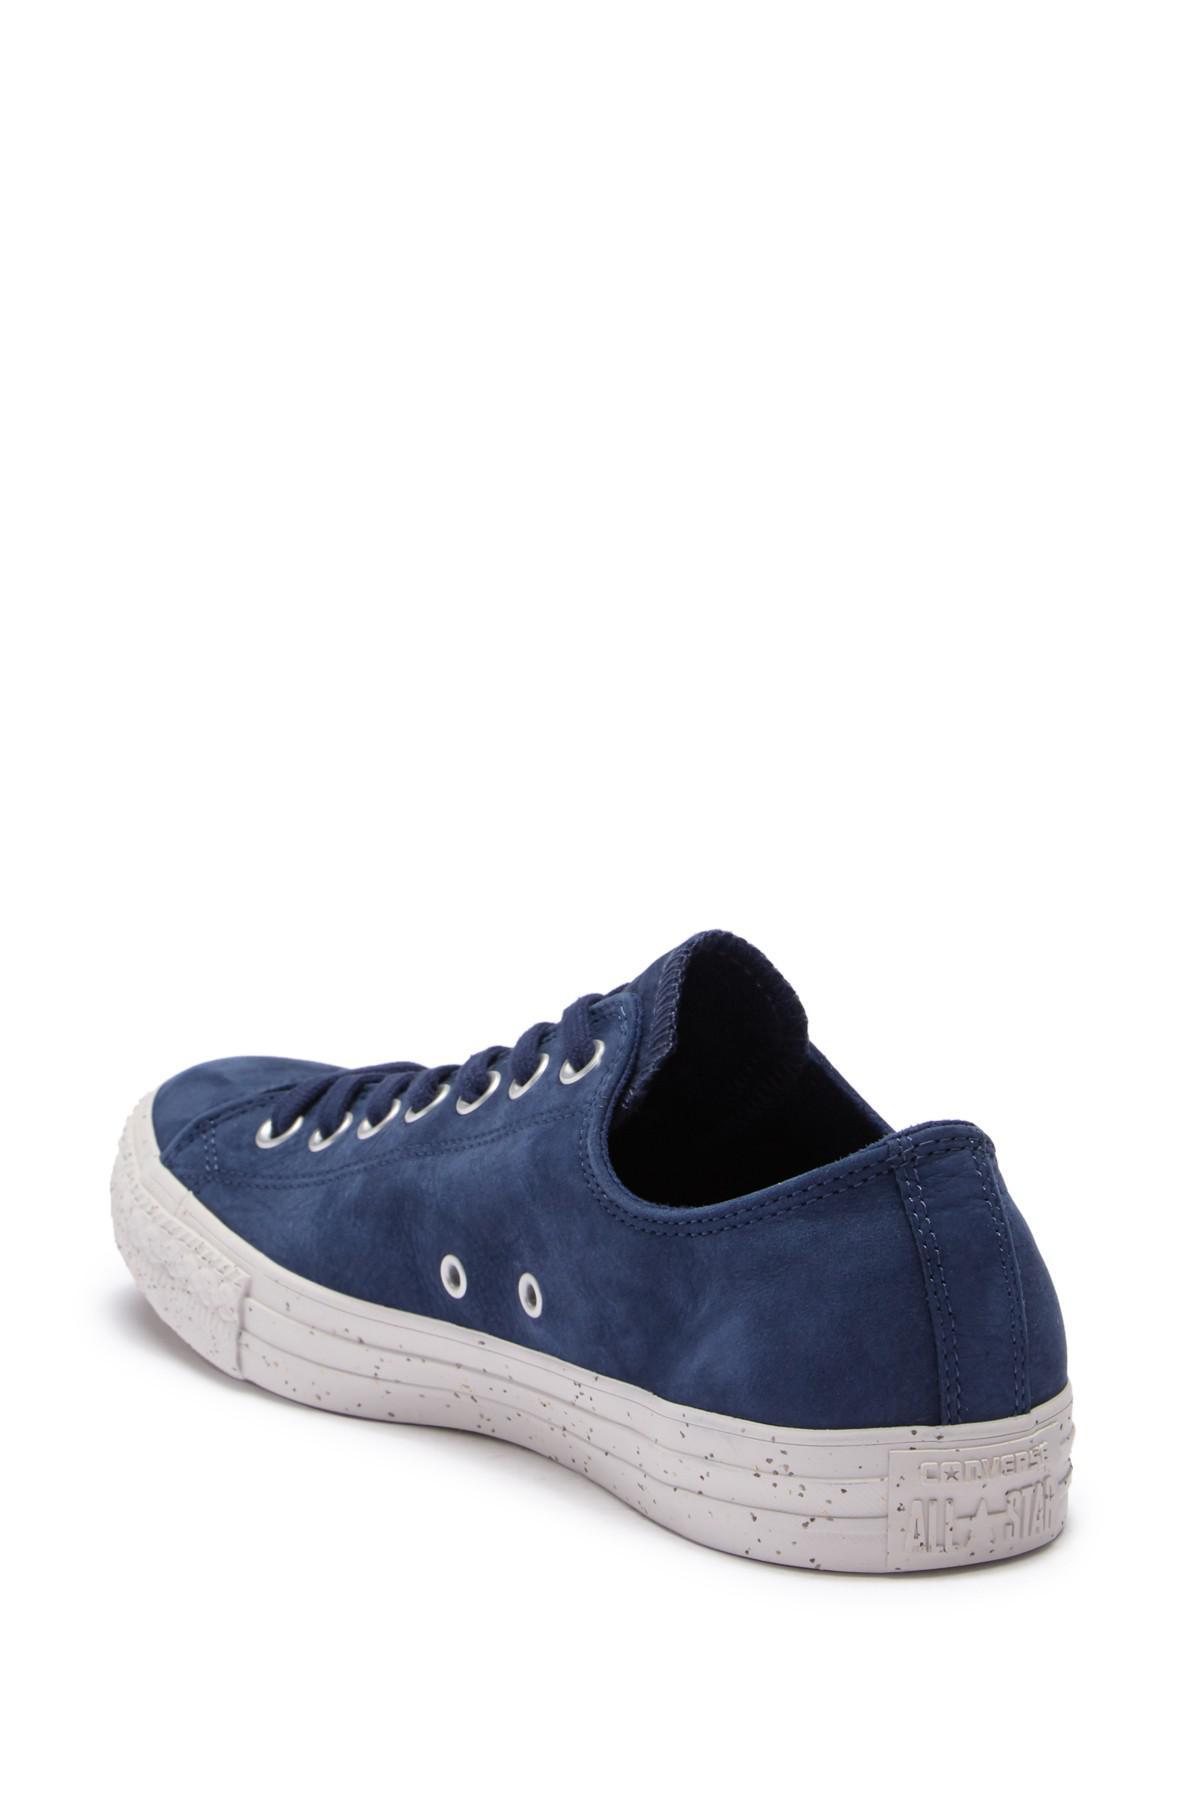 51e6b3f0cc21 Converse - Blue Chuck Taylor All-star Ox Suede Sneaker (unisex) for Men.  View fullscreen